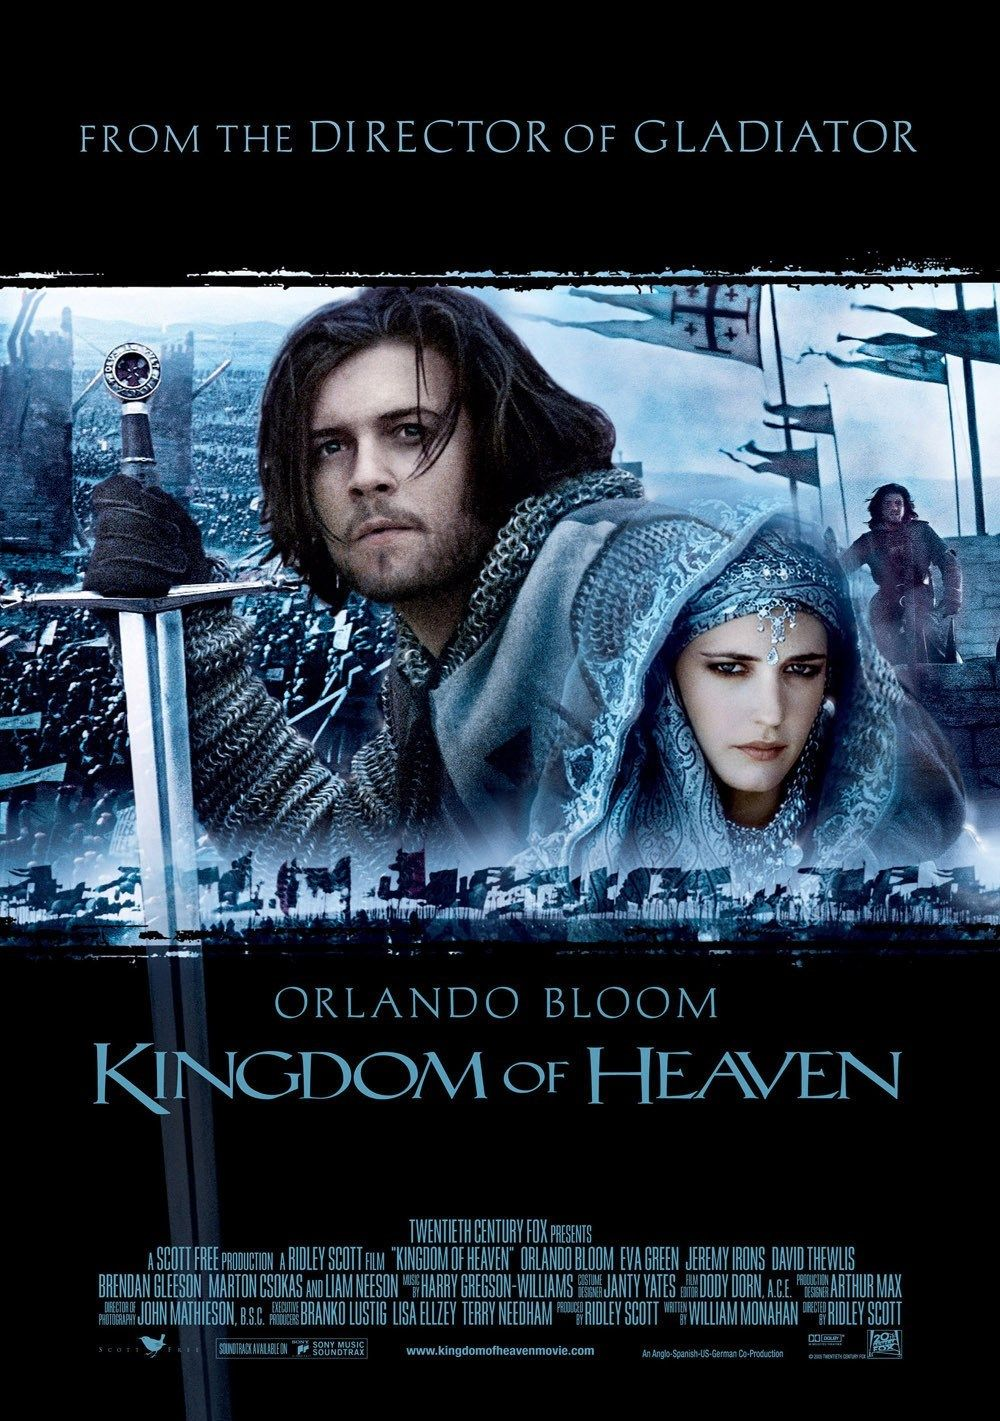 Kingdom Of Heaven Filmes Epicos Filmes Posteres De Filmes